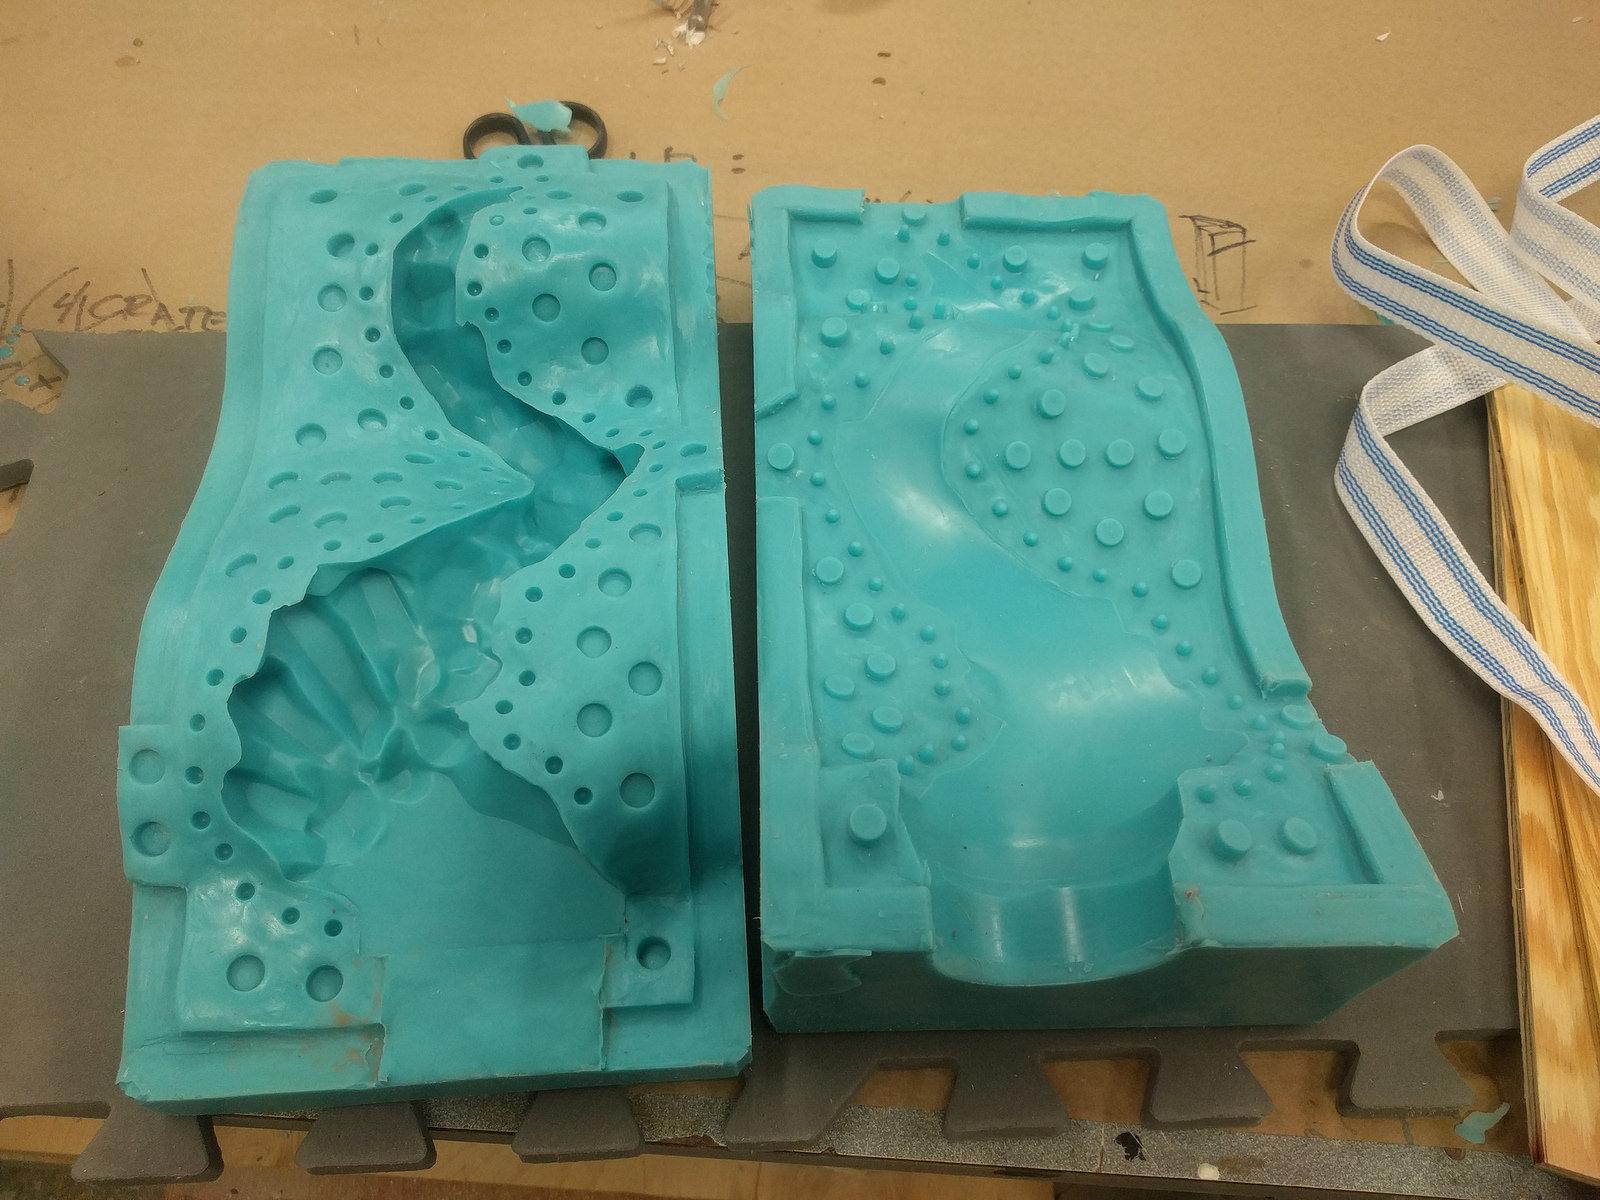 Crystal Molds